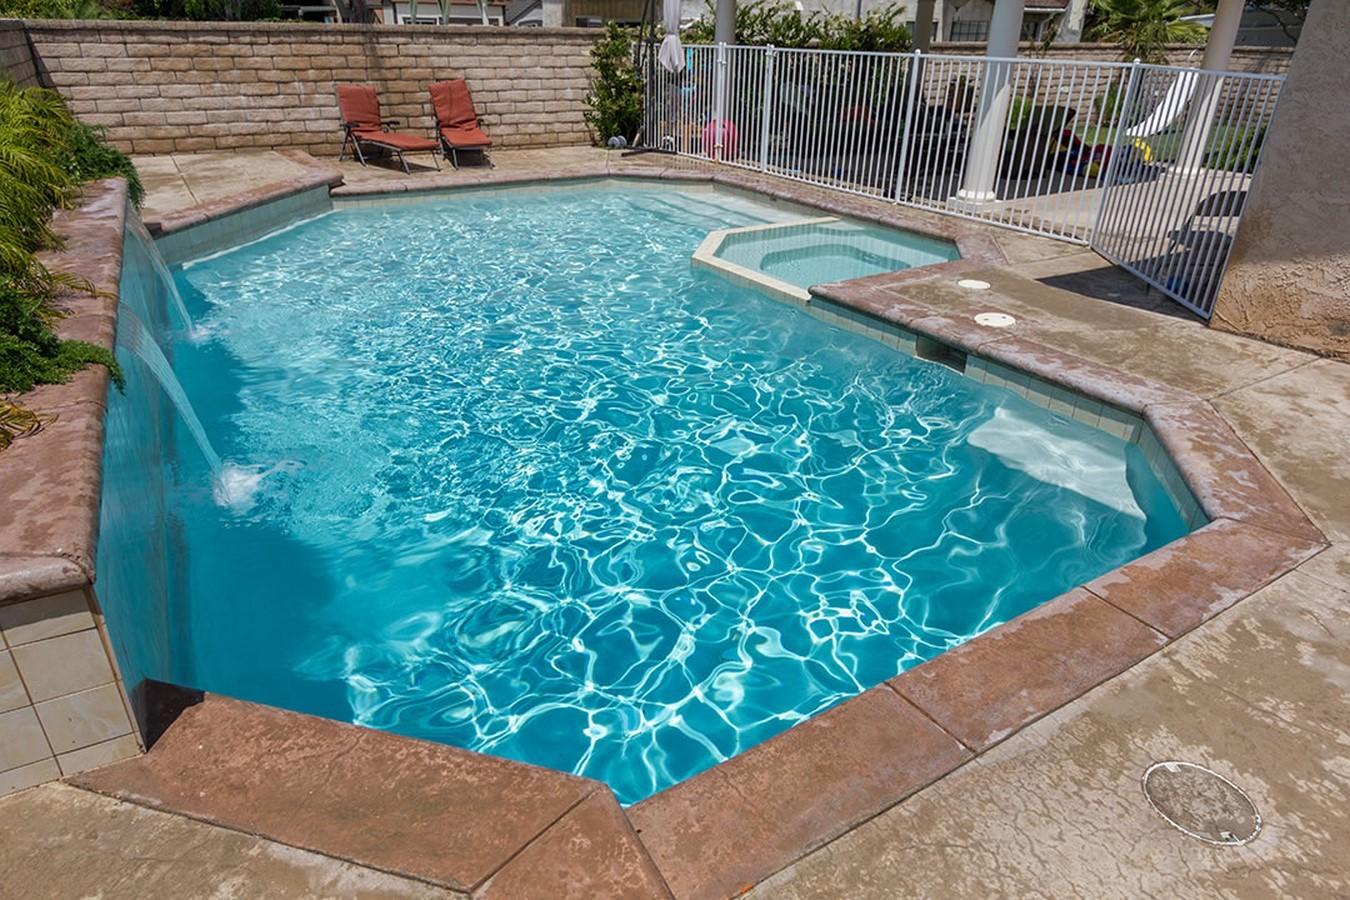 25 flooring patterns for Swimming Pools - Sheet2